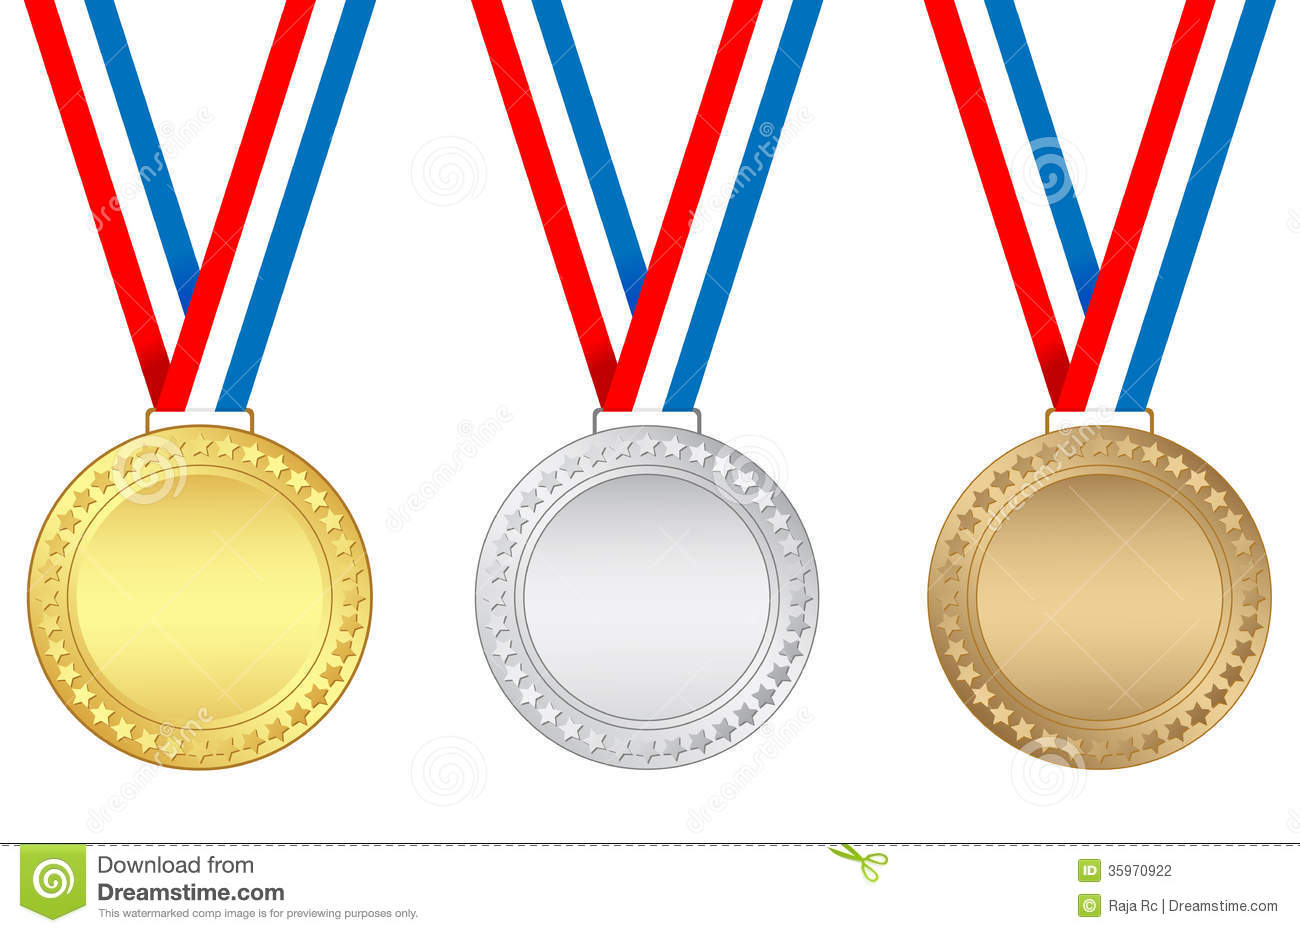 Award Medals Clipart.